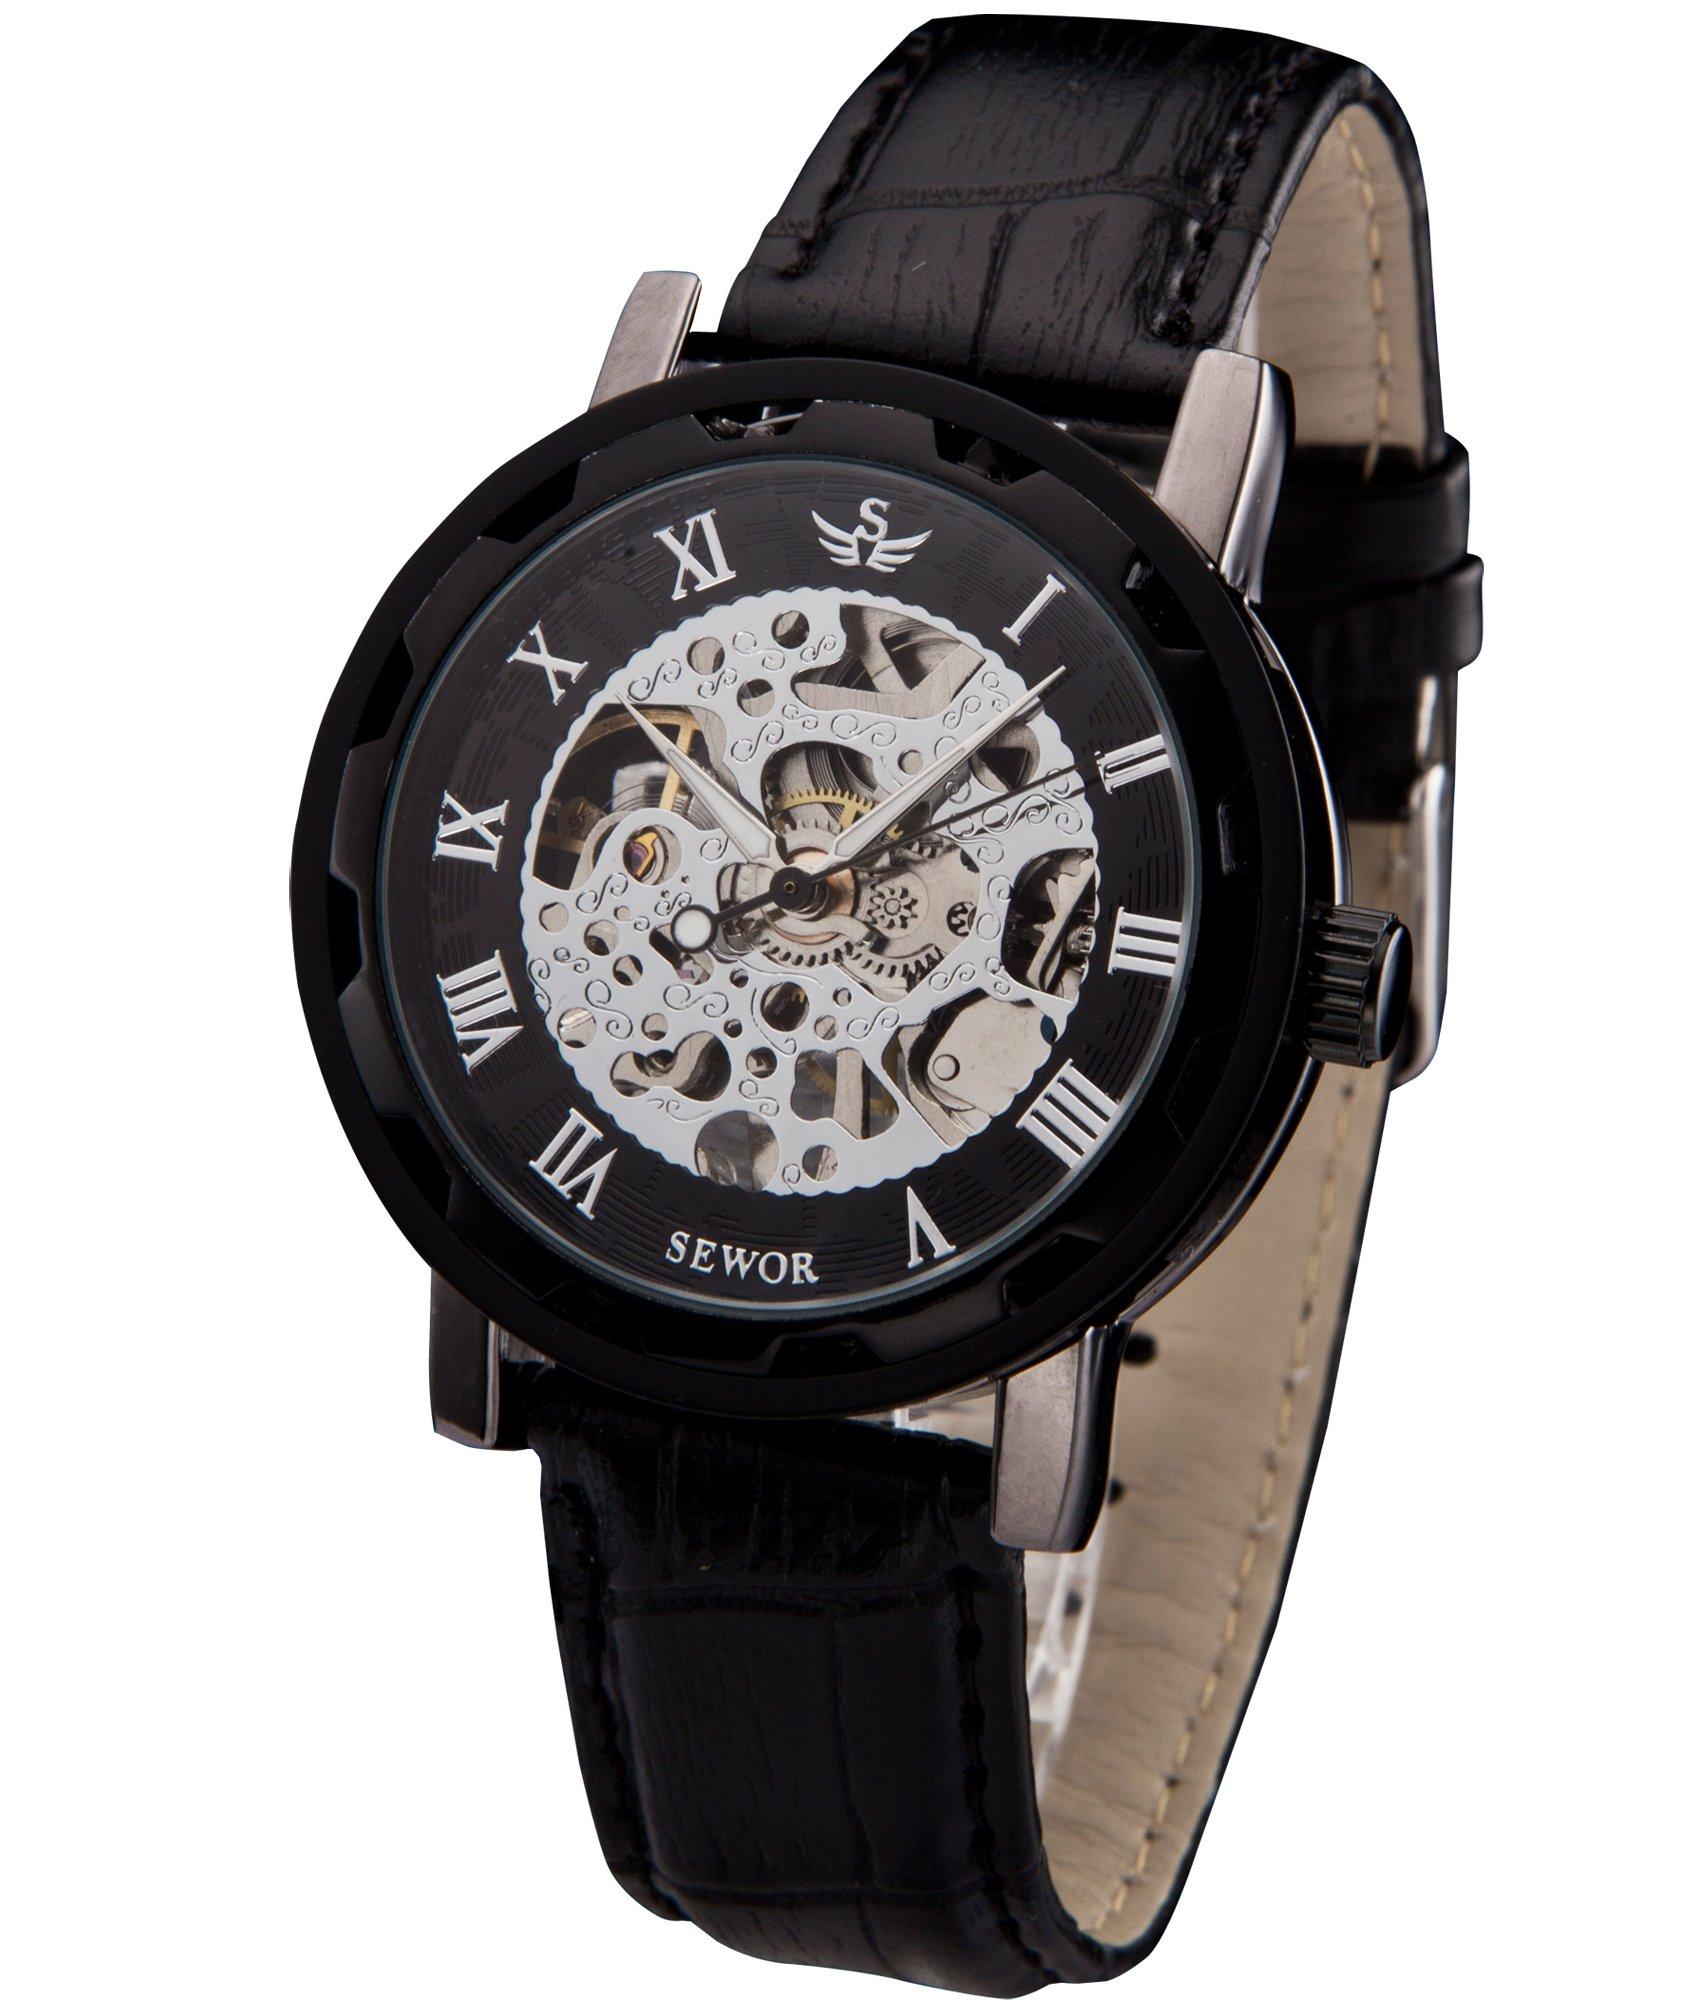 2017 New Fashion Skeleton Black Steel Men Male Clock Sewor Brand Hollow Cool Stylish Design Classic Mechanical Wrist Dress Watch Mechanical Watches